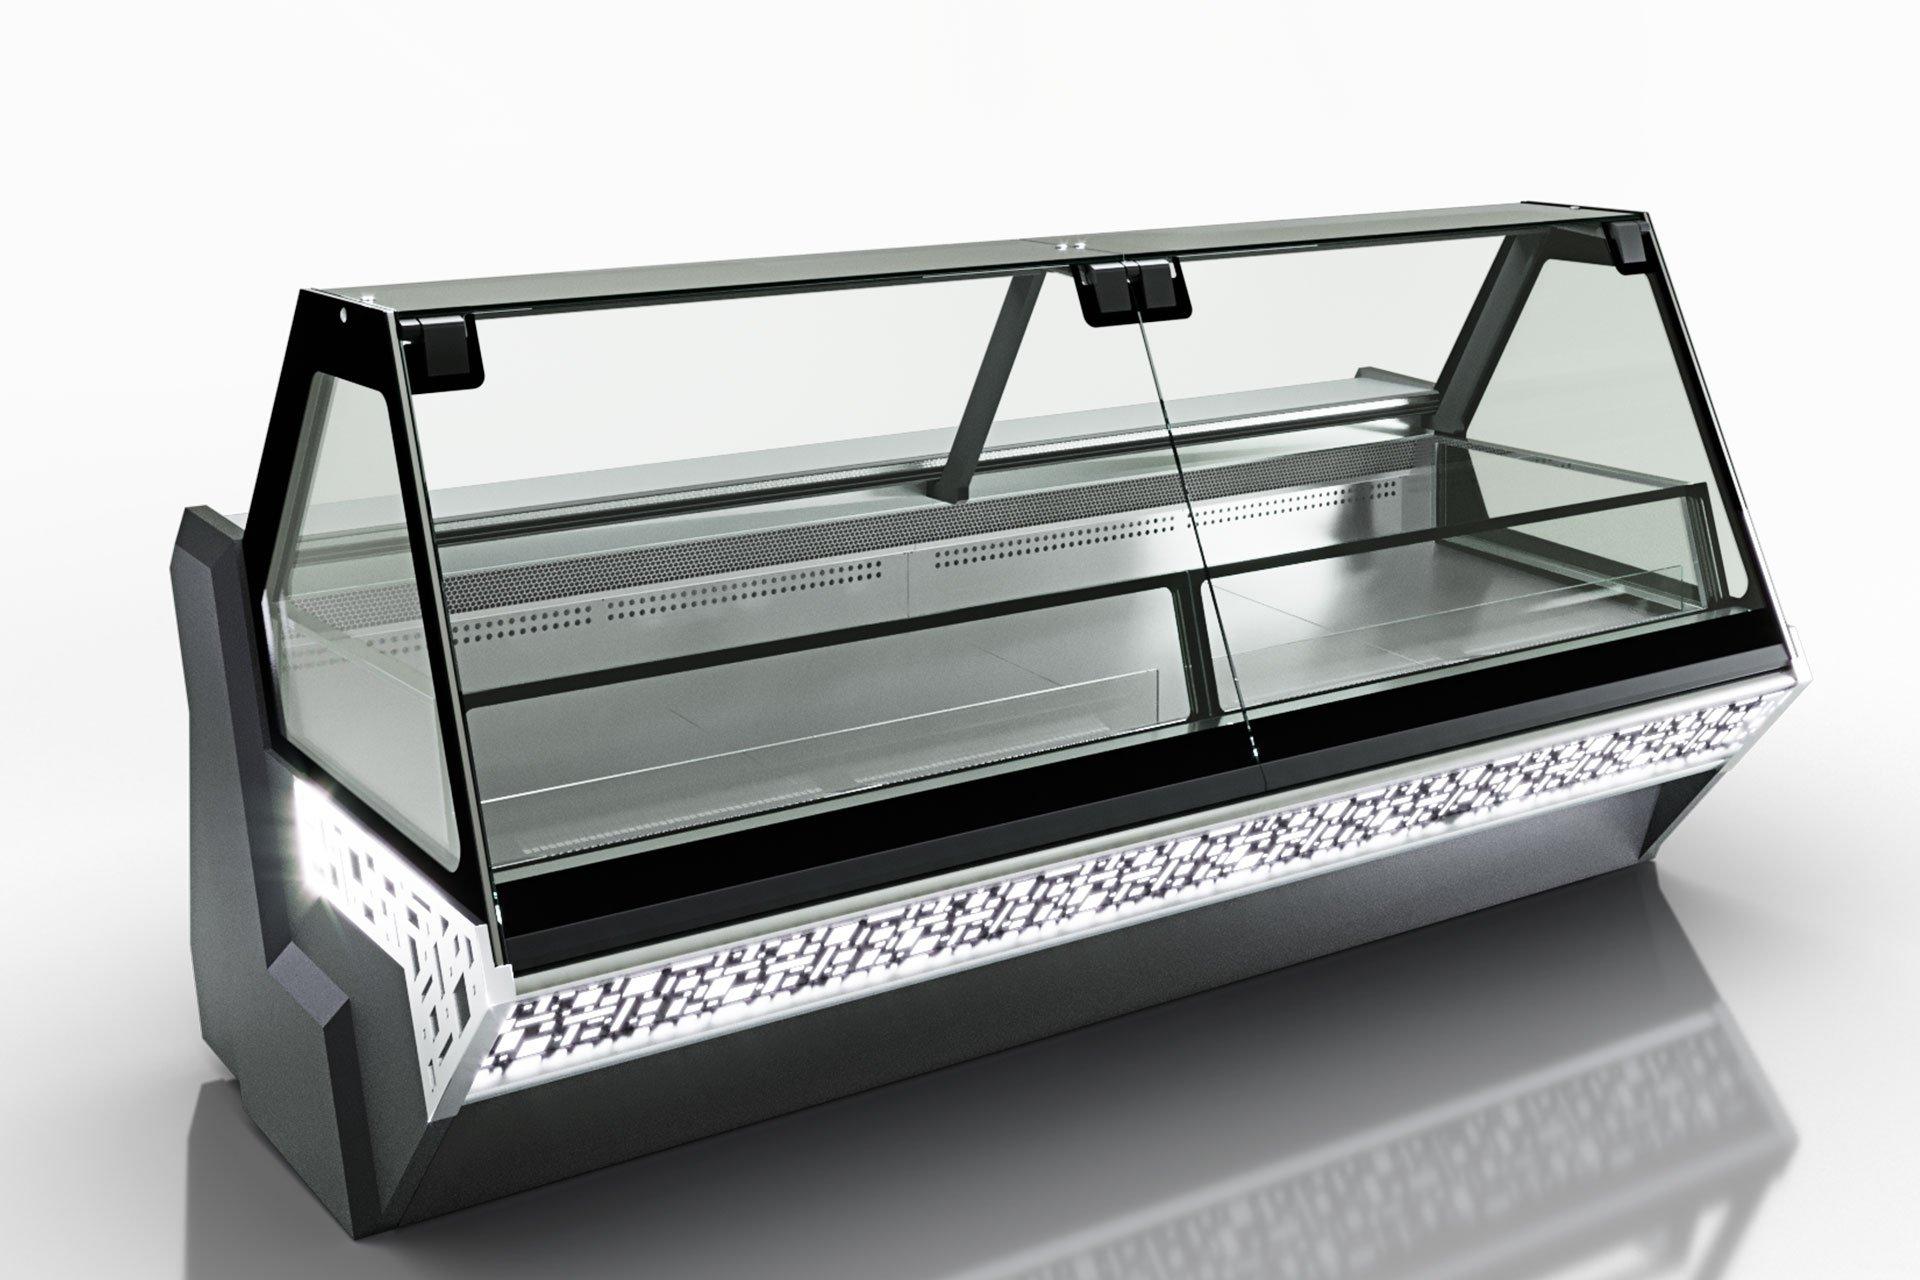 Kühlvitrinen Missouri sapphire MK 115 LT PS 125-DLM